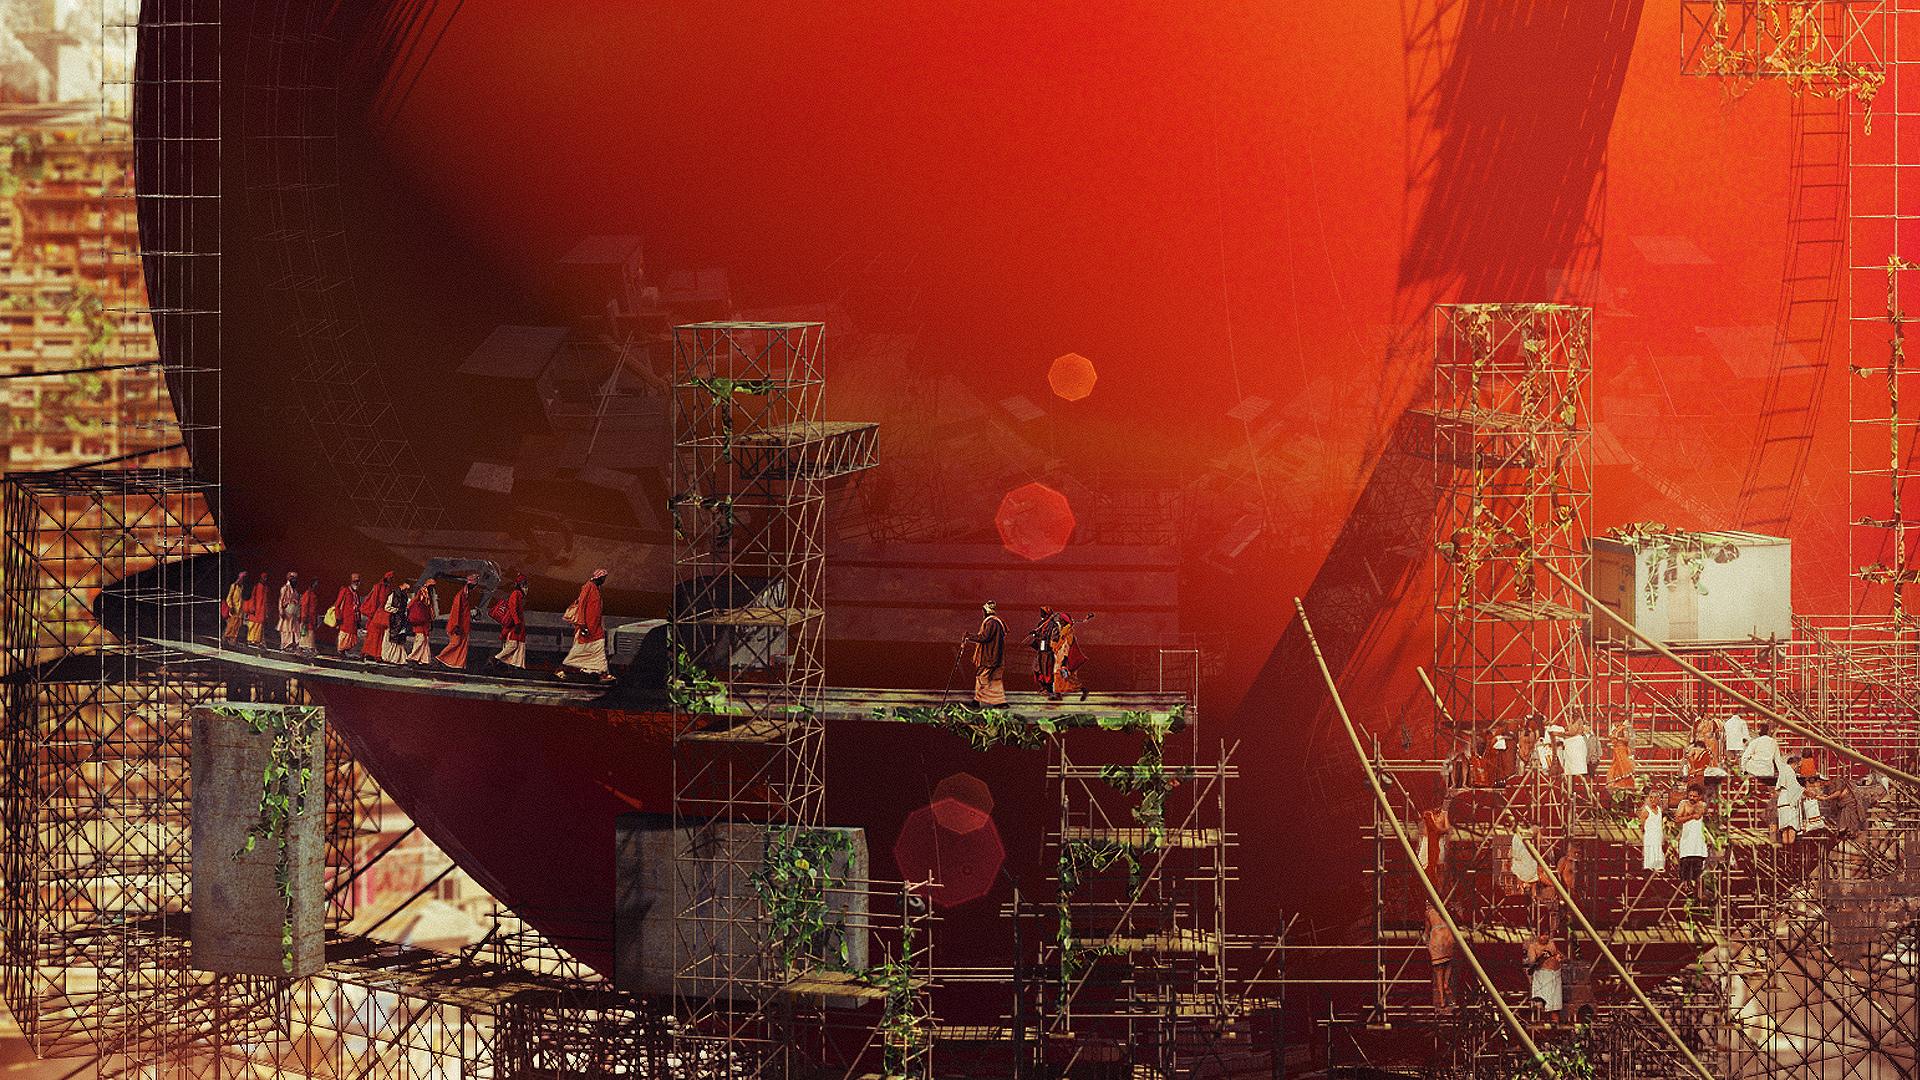 planetfactory02.jpg